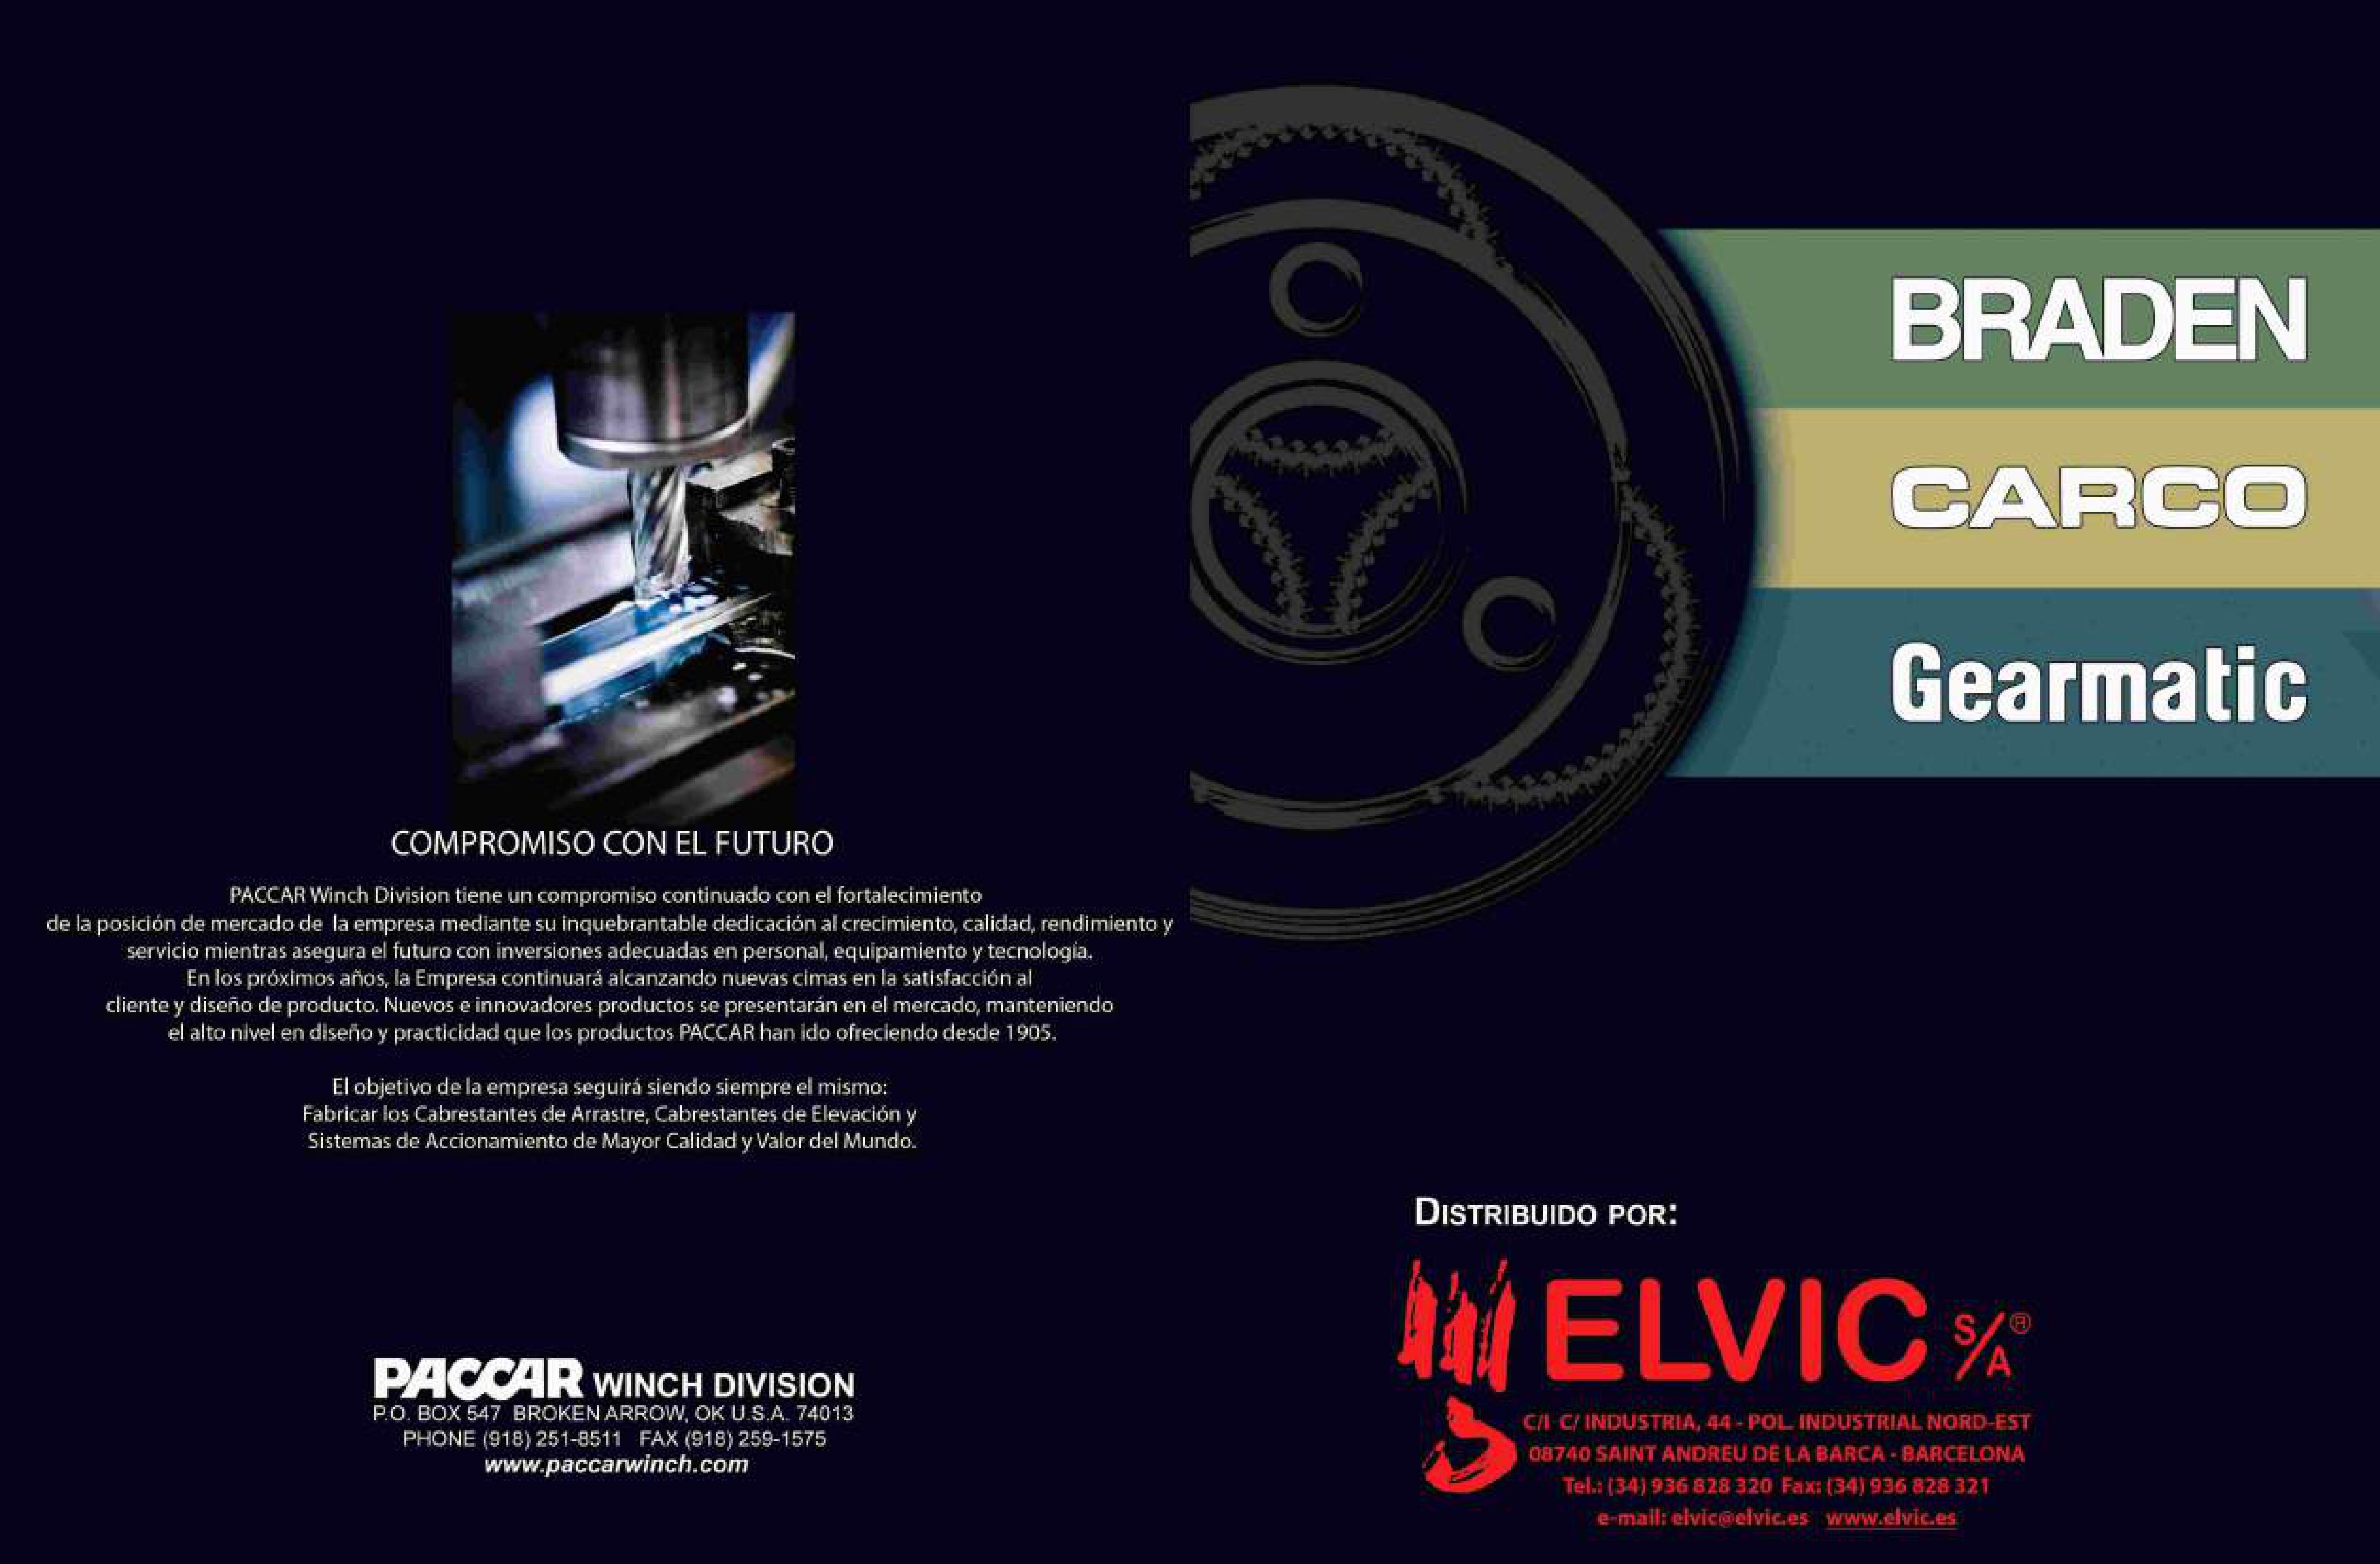 Catálogo Elvic Paccar